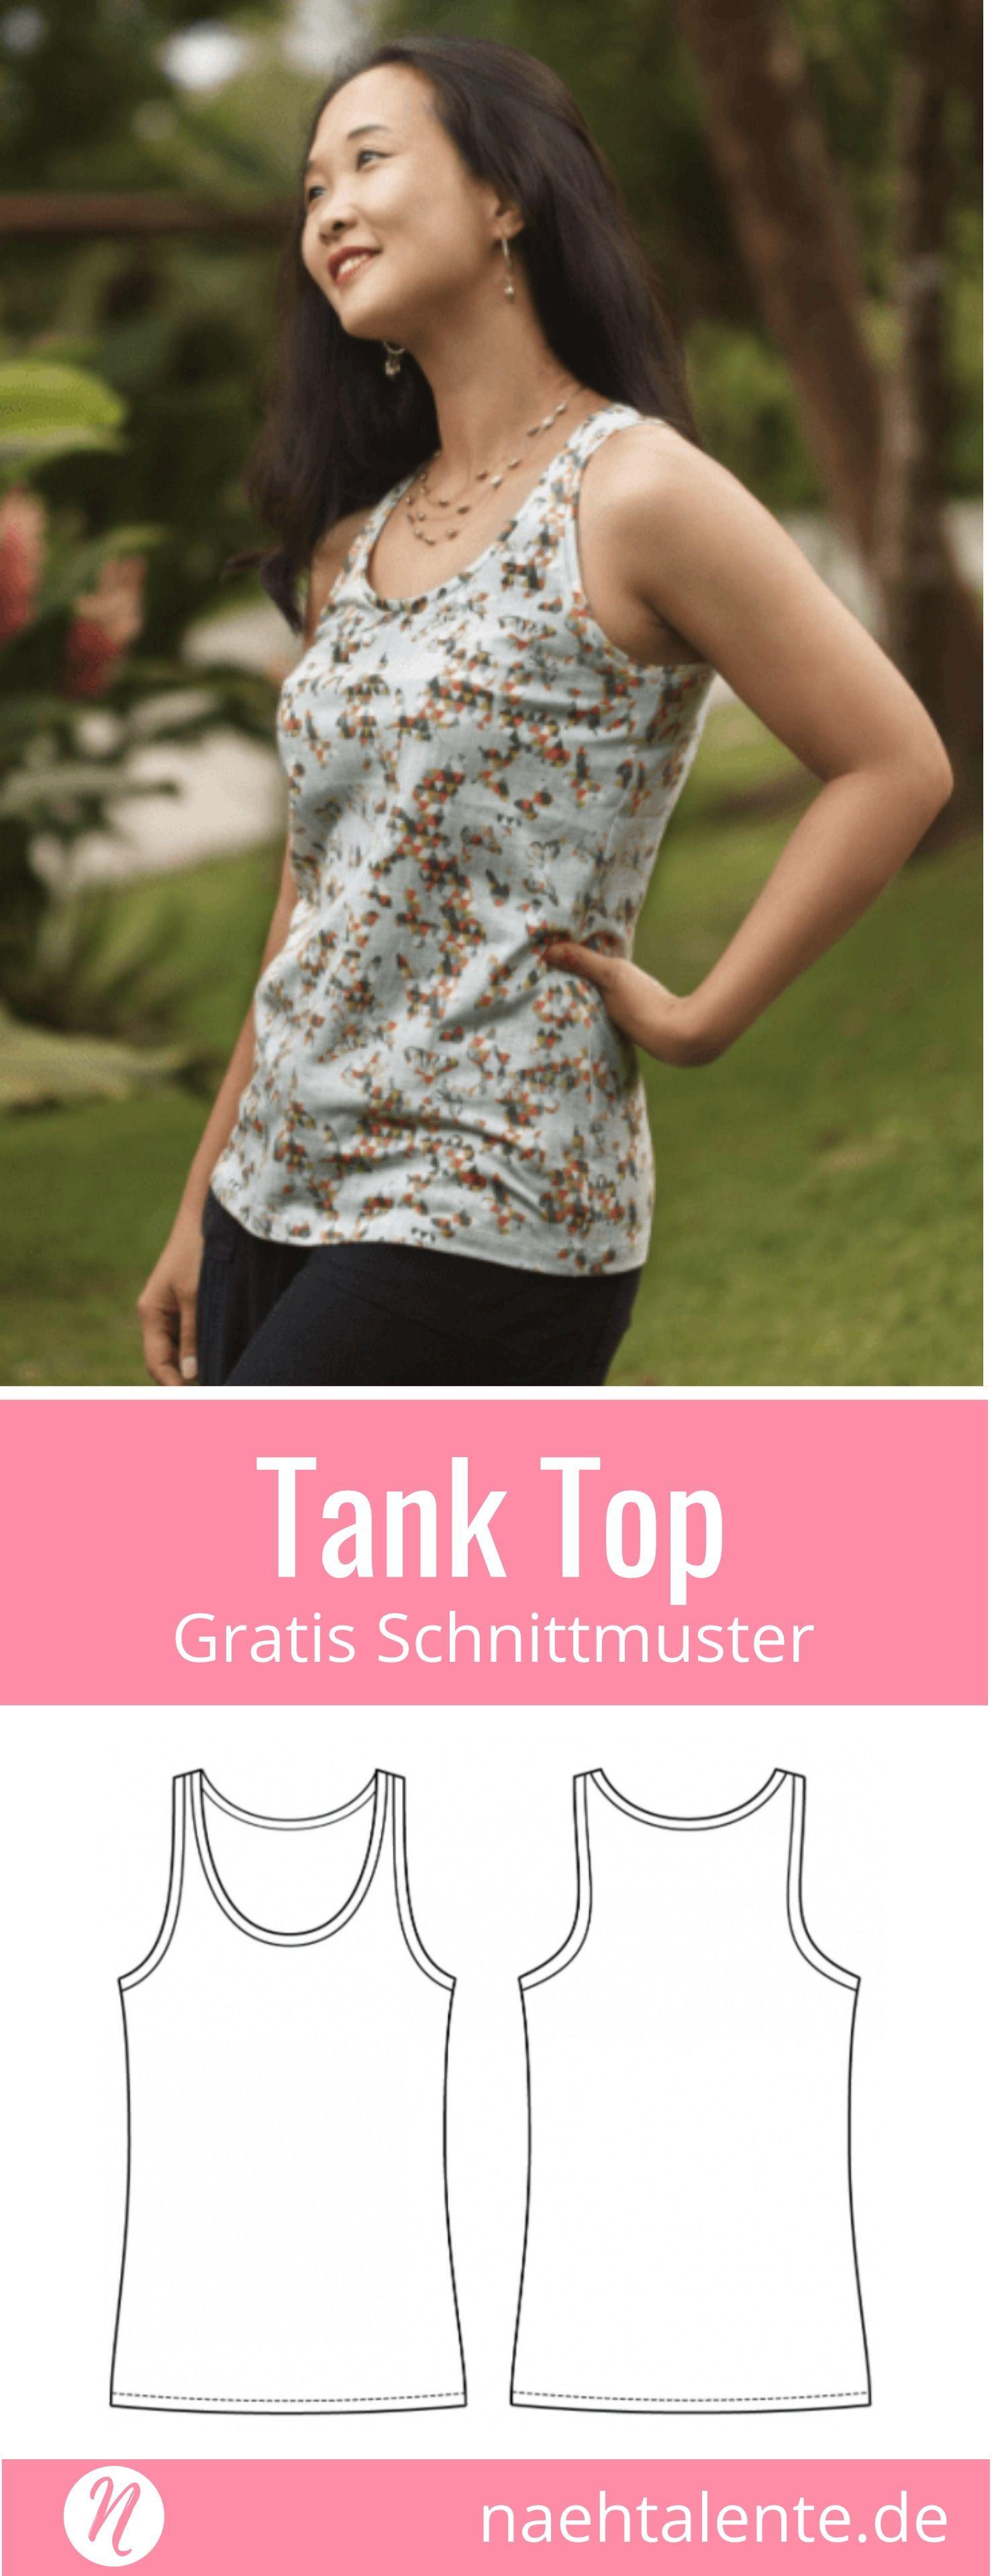 Tank Top für Damen | Pinterest | Gratis schnittmuster, Ausdrucken ...